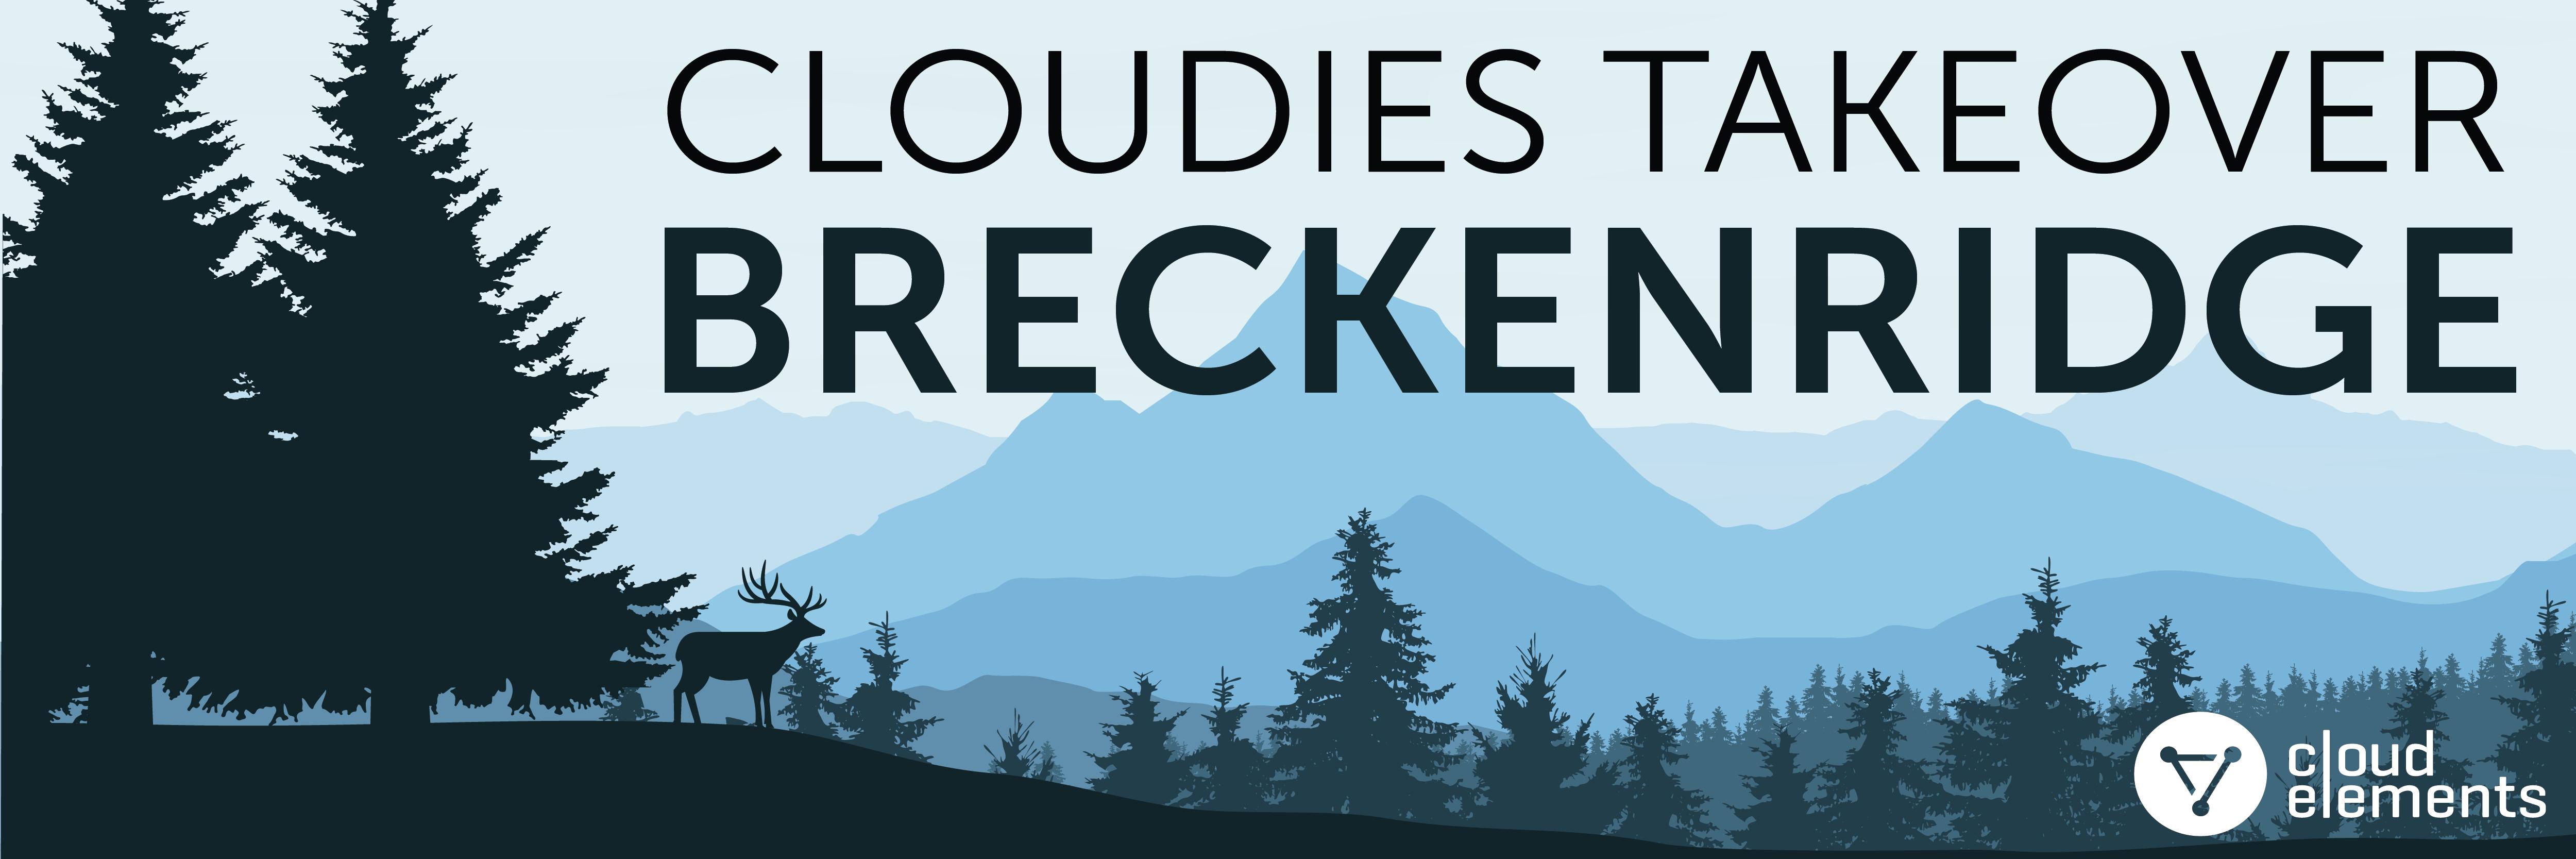 Cloudies Takeover Breckenridge Banner